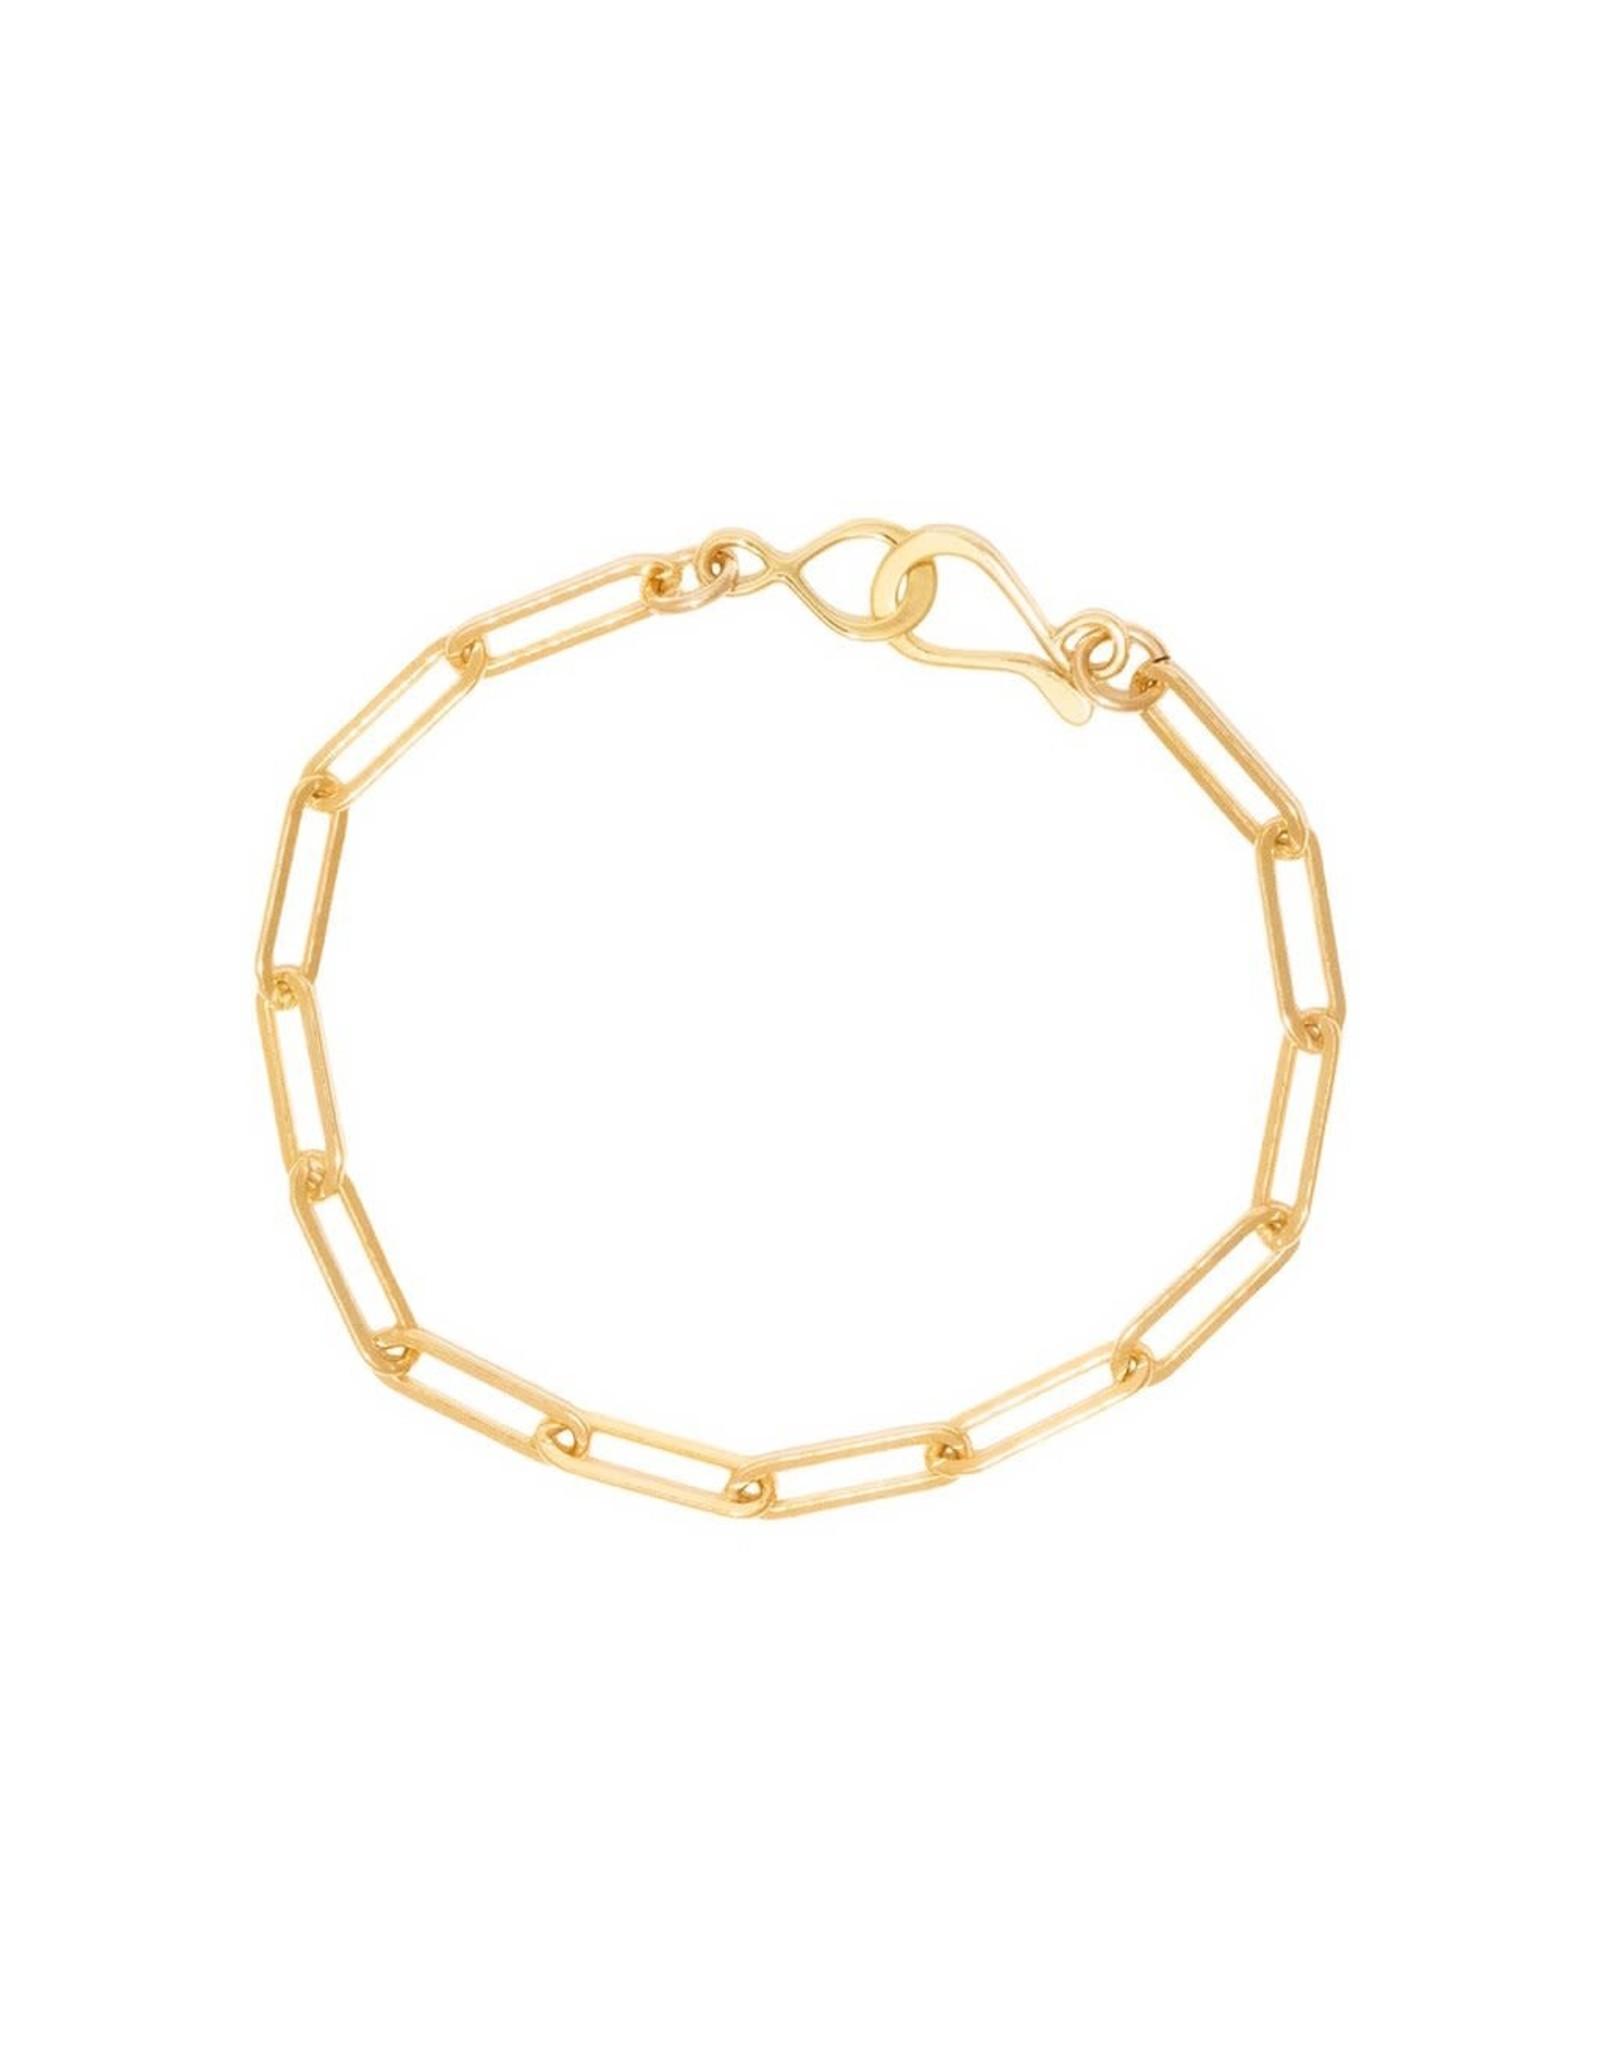 leah alexandra Hailey Bracelet | Goldfill